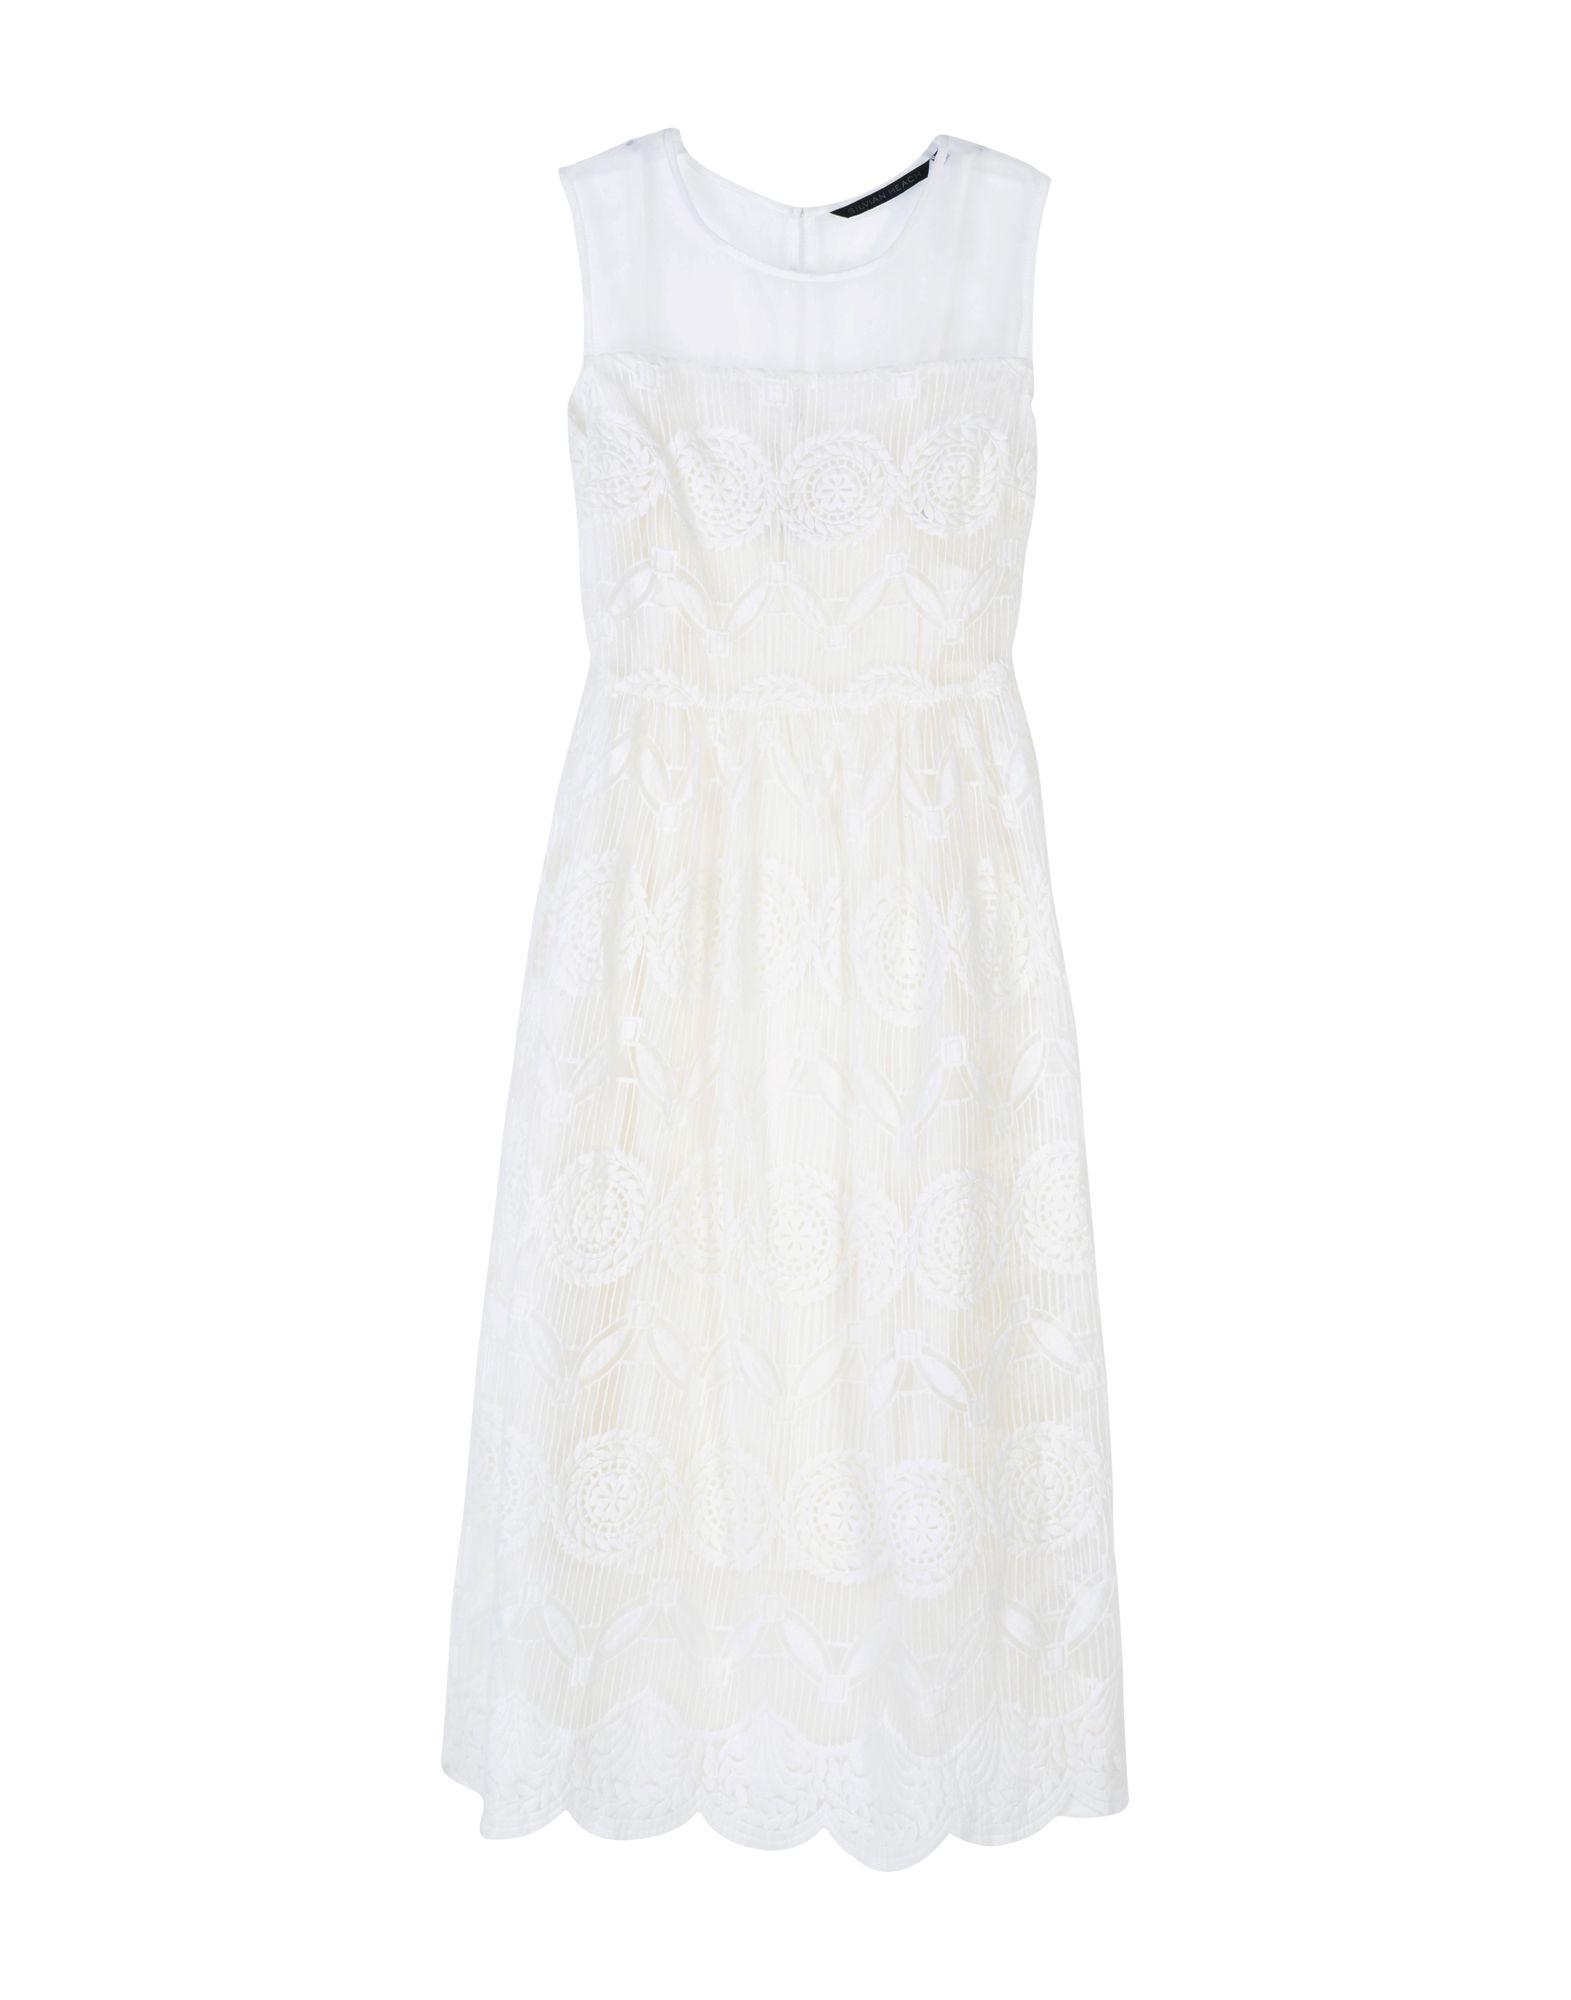 SILVIAN HEACH Платье длиной 3/4 lisa corti платье длиной 3 4